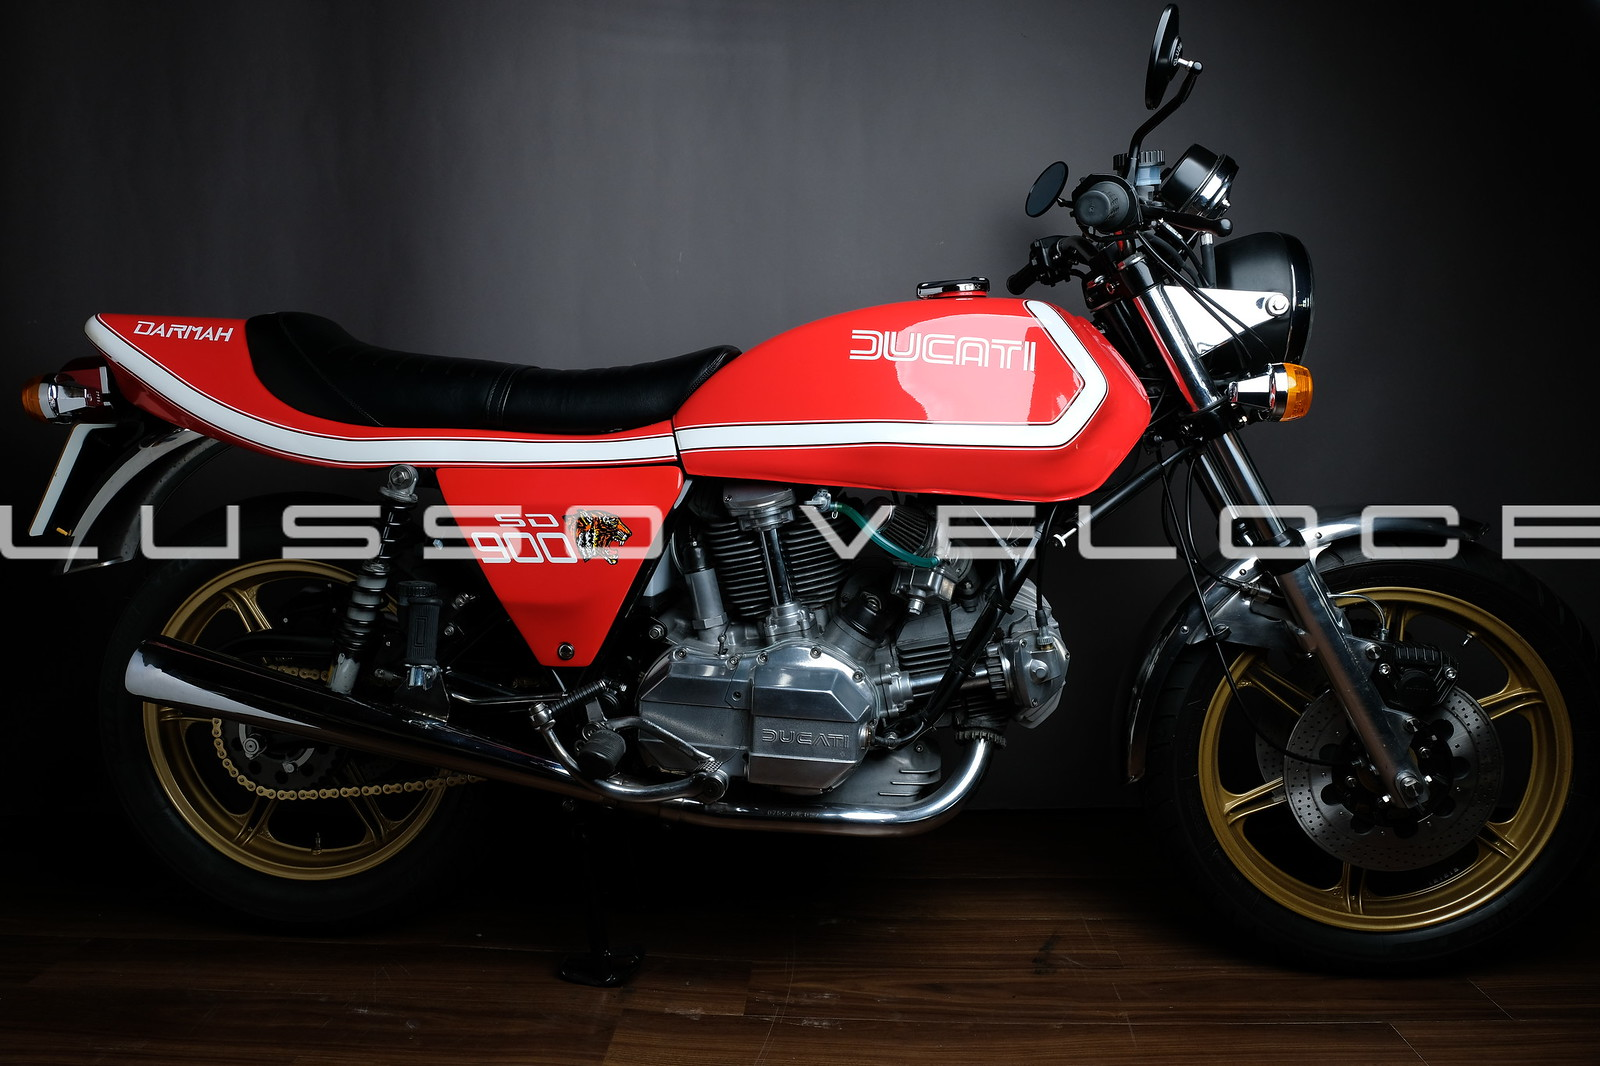 Ducati Darmah 900 Bevel